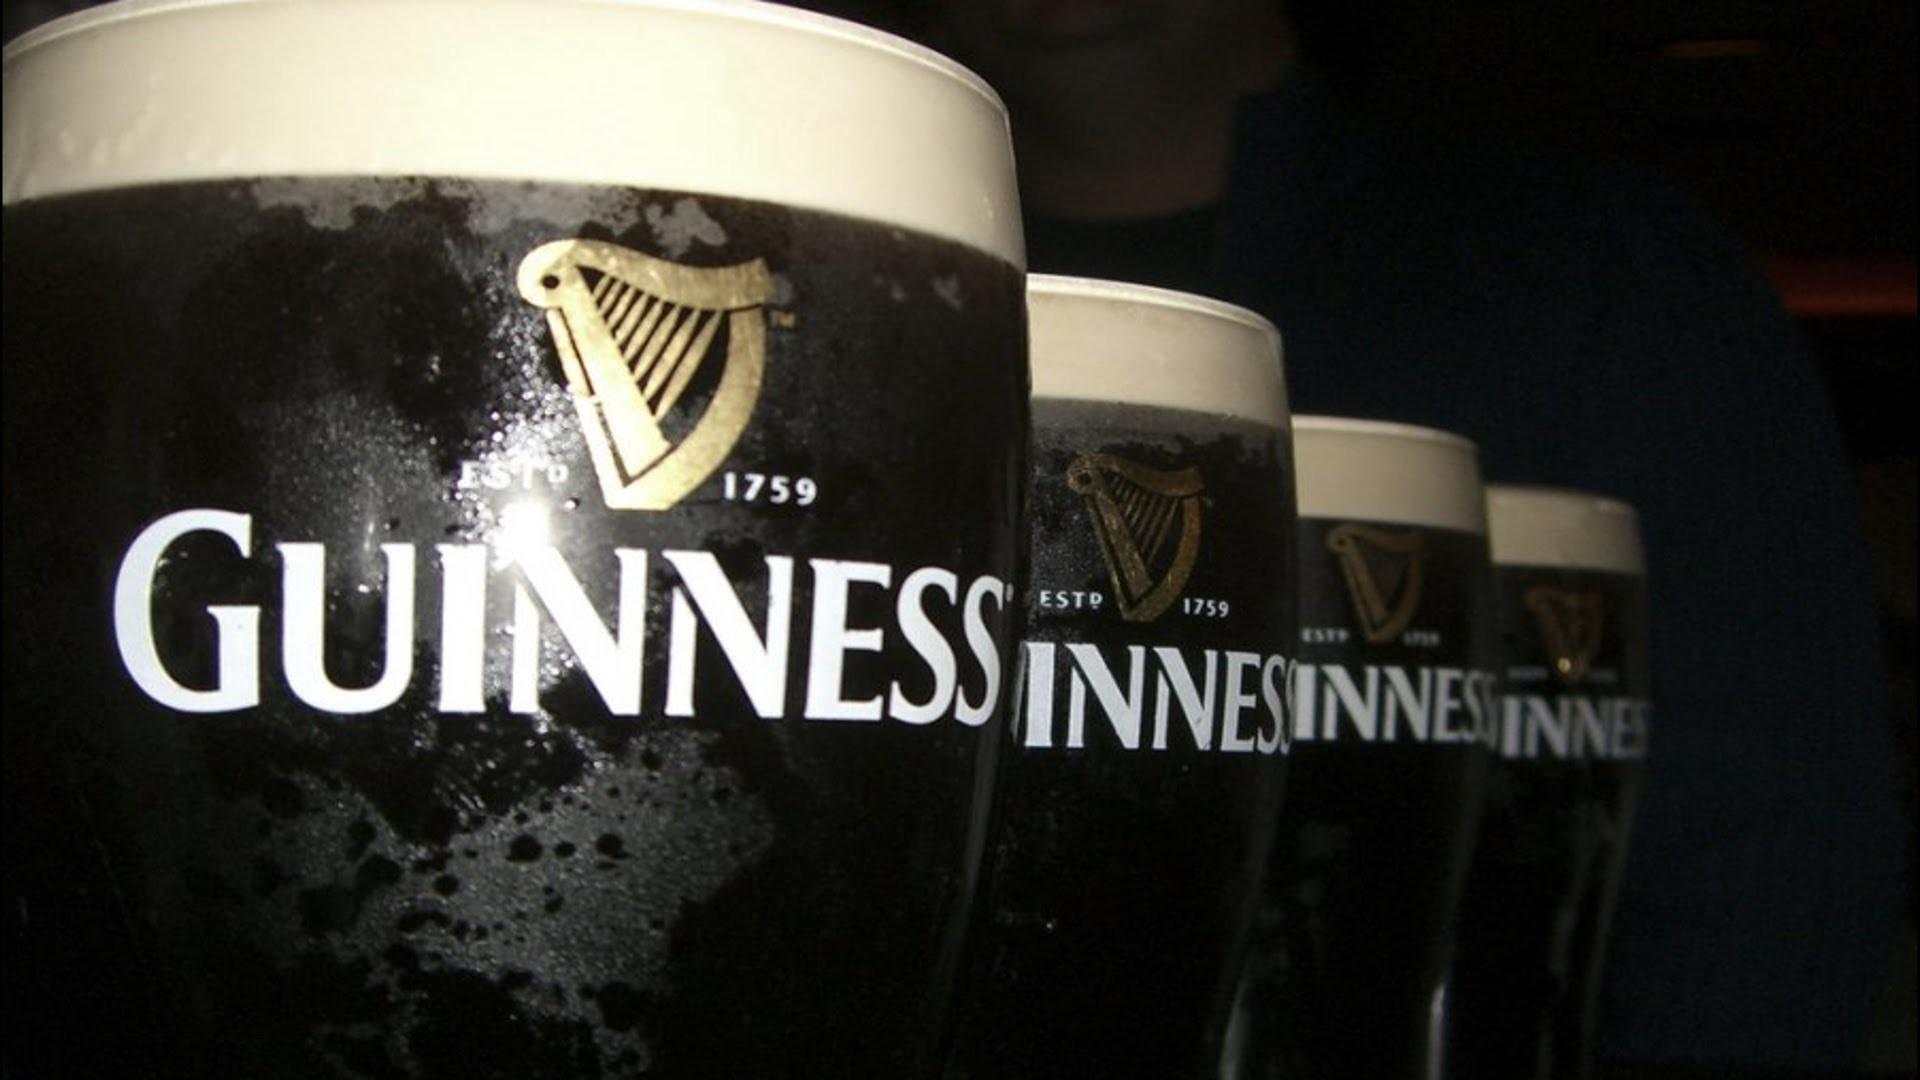 Res: 1920x1080, Guinness Gauntlet Challenge